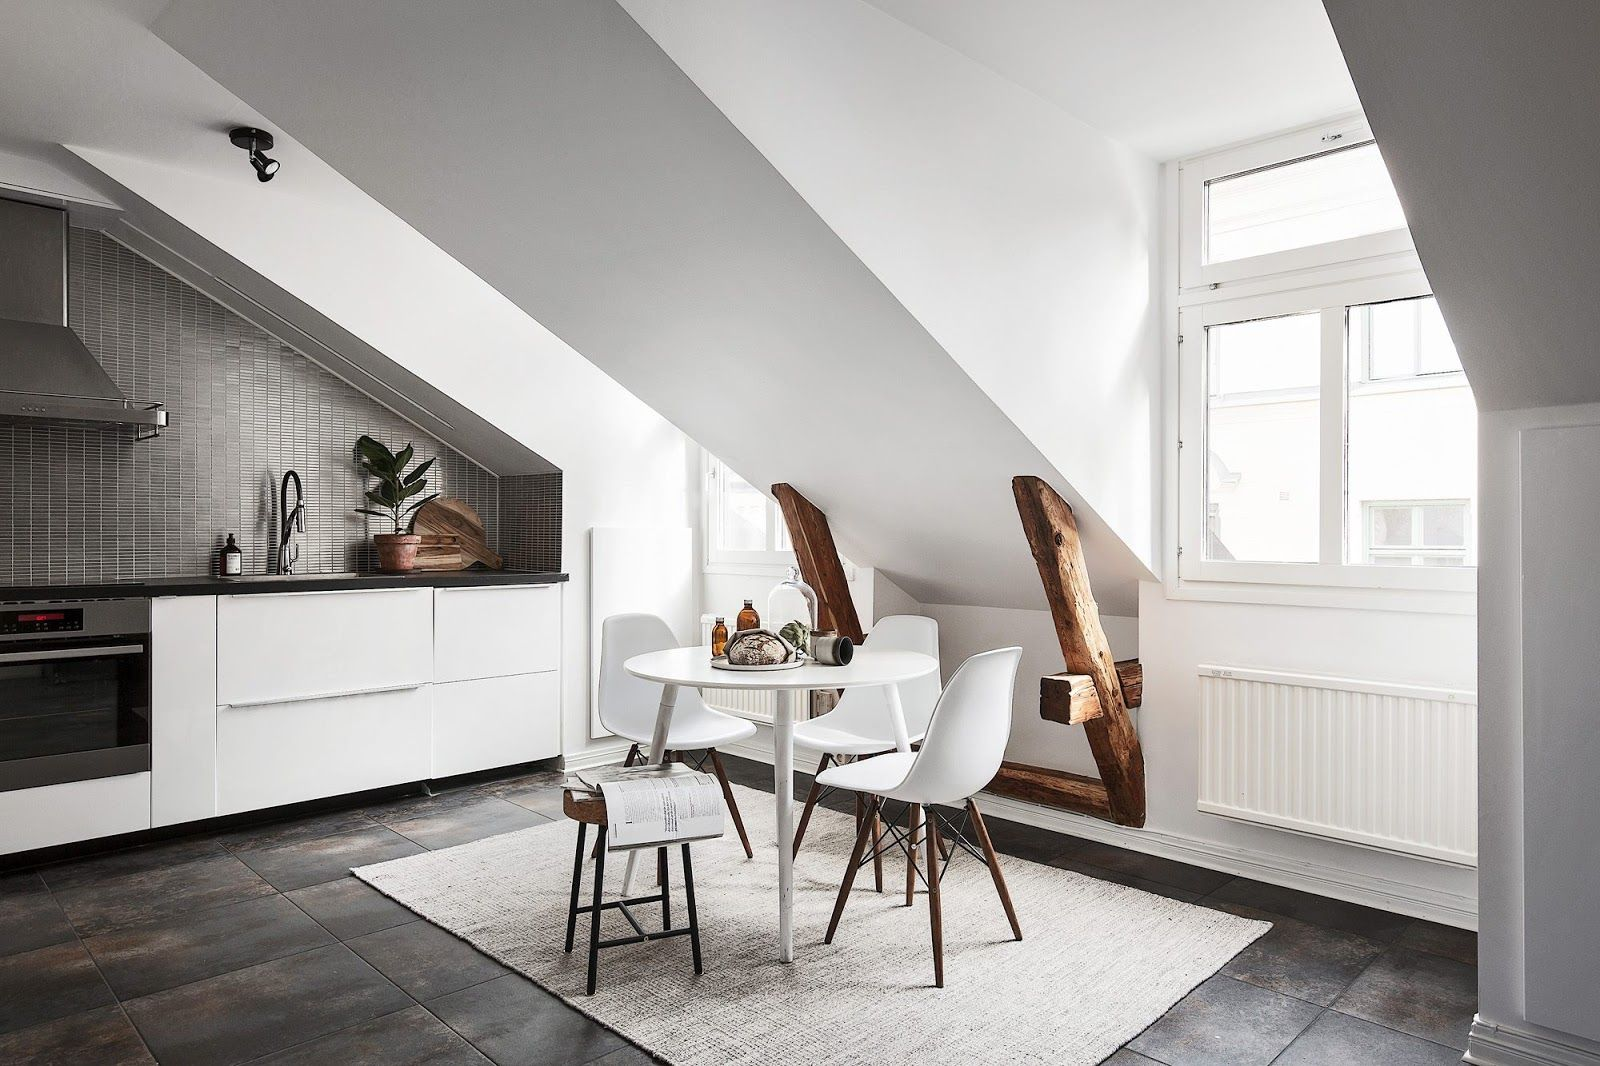 Alb scandinav într-o mansardă de 65 m² Jurnal de design interior